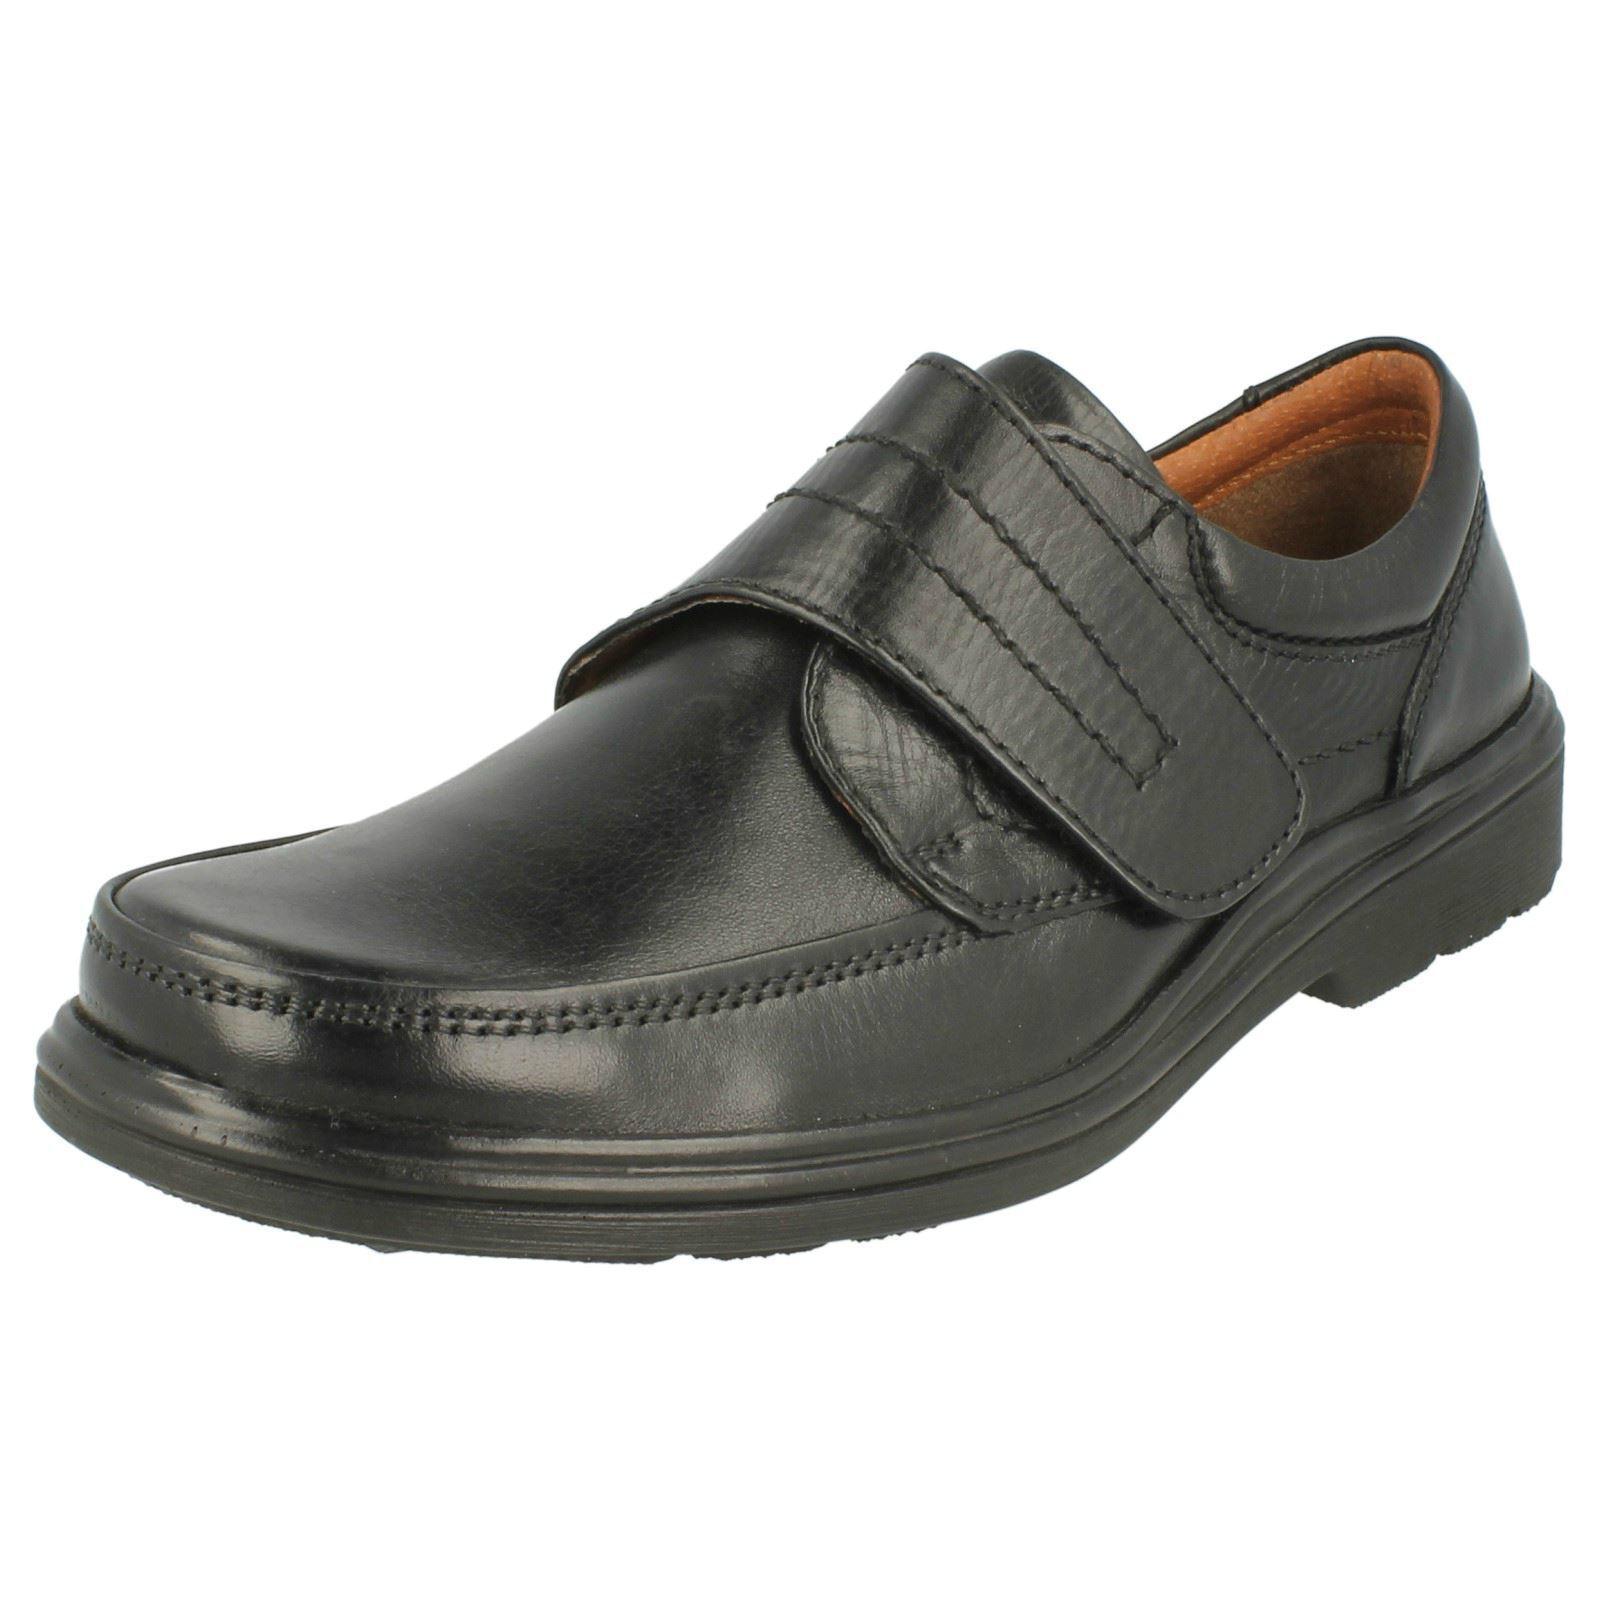 MAVERICK A1108 chaussures NOIR HOMMES riptape 100% chaussures A1108 cuir e41005